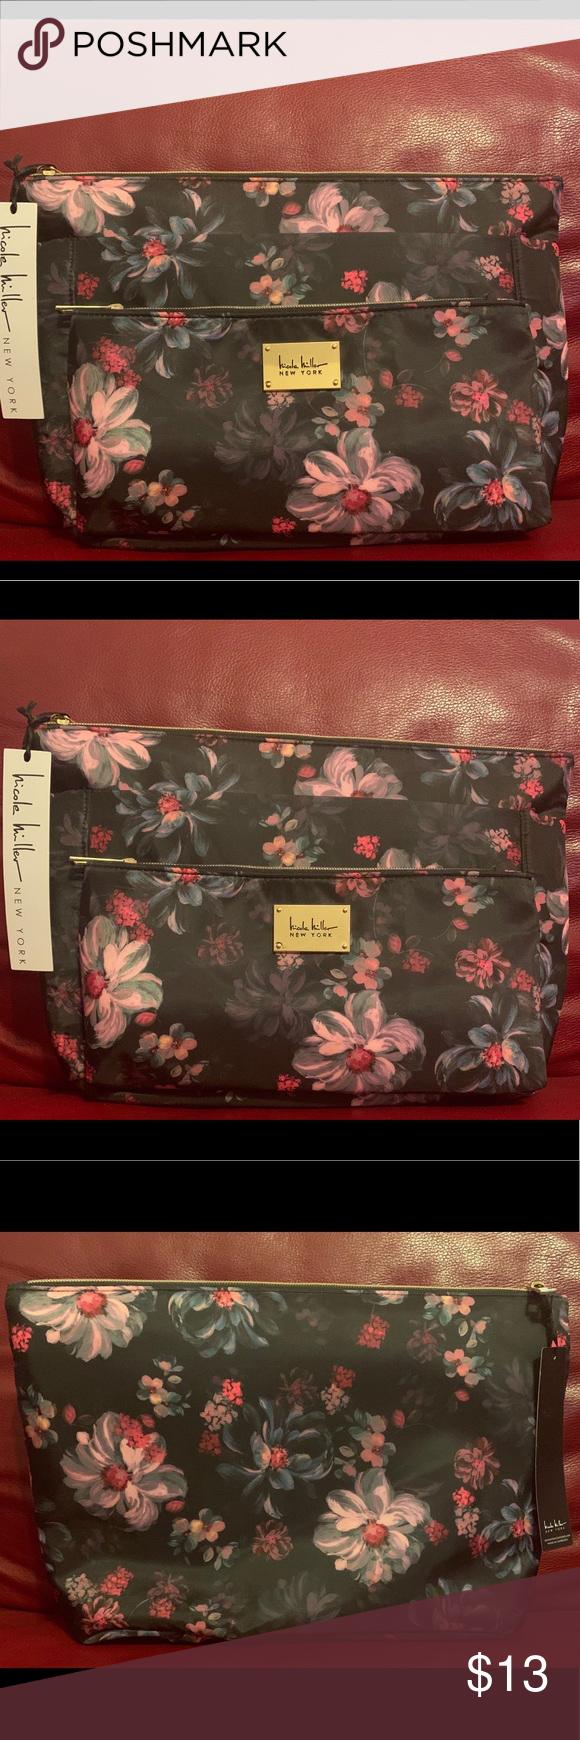 Nicole Miller Floral Cosmetics Bag Cosmetic bag, Nicole